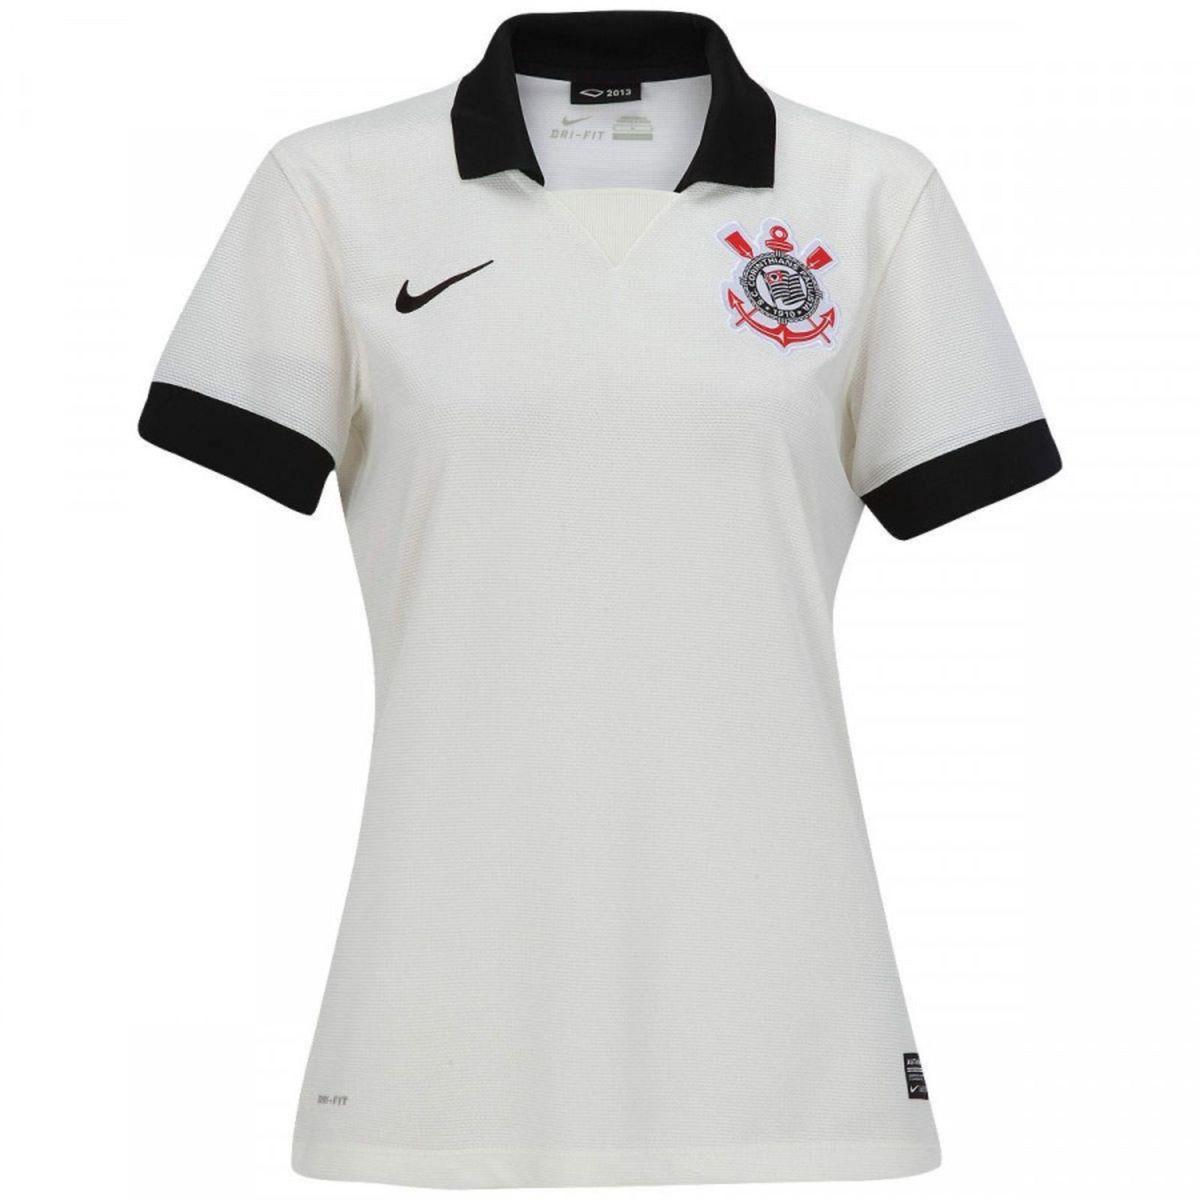 a58e34ff4047c Camisa Corinthians Feminina Branca - Nike